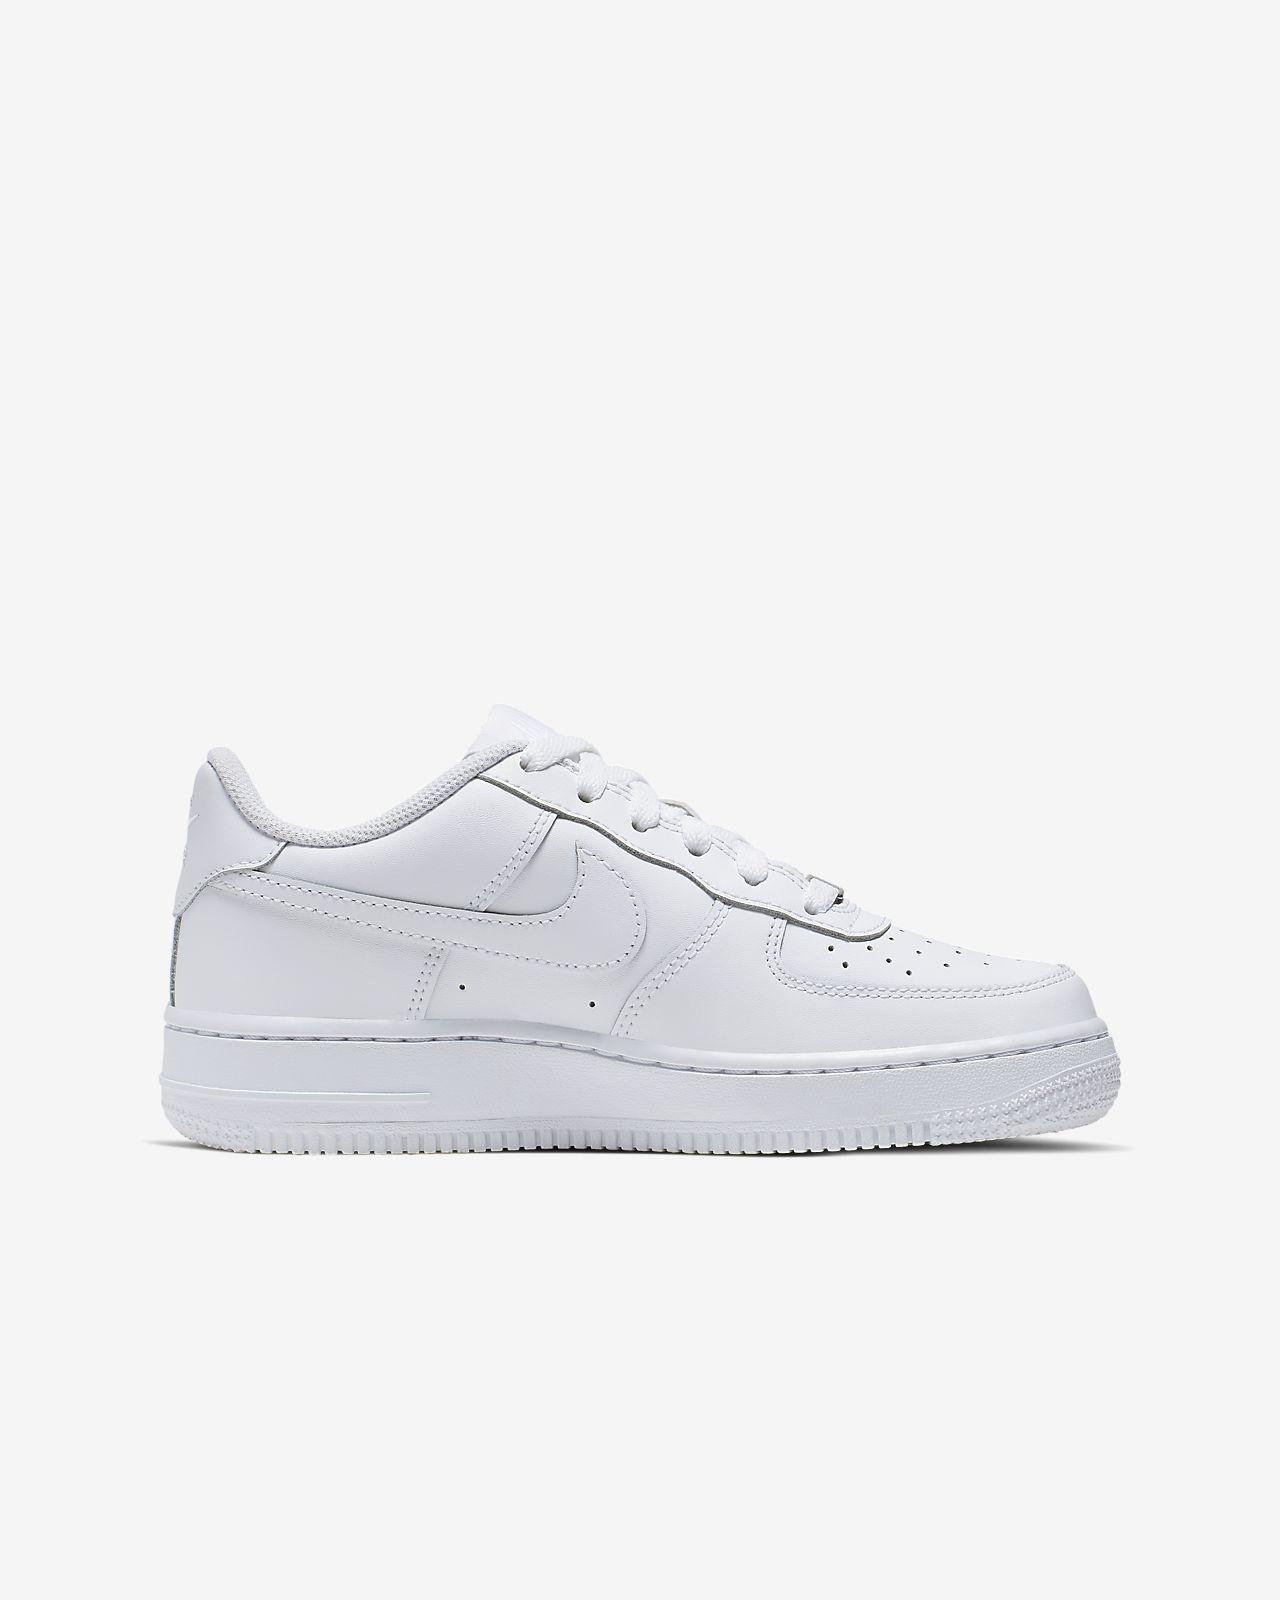 best loved 537fb 3278a ... Nike Air Force 1 Older Kids  Shoe